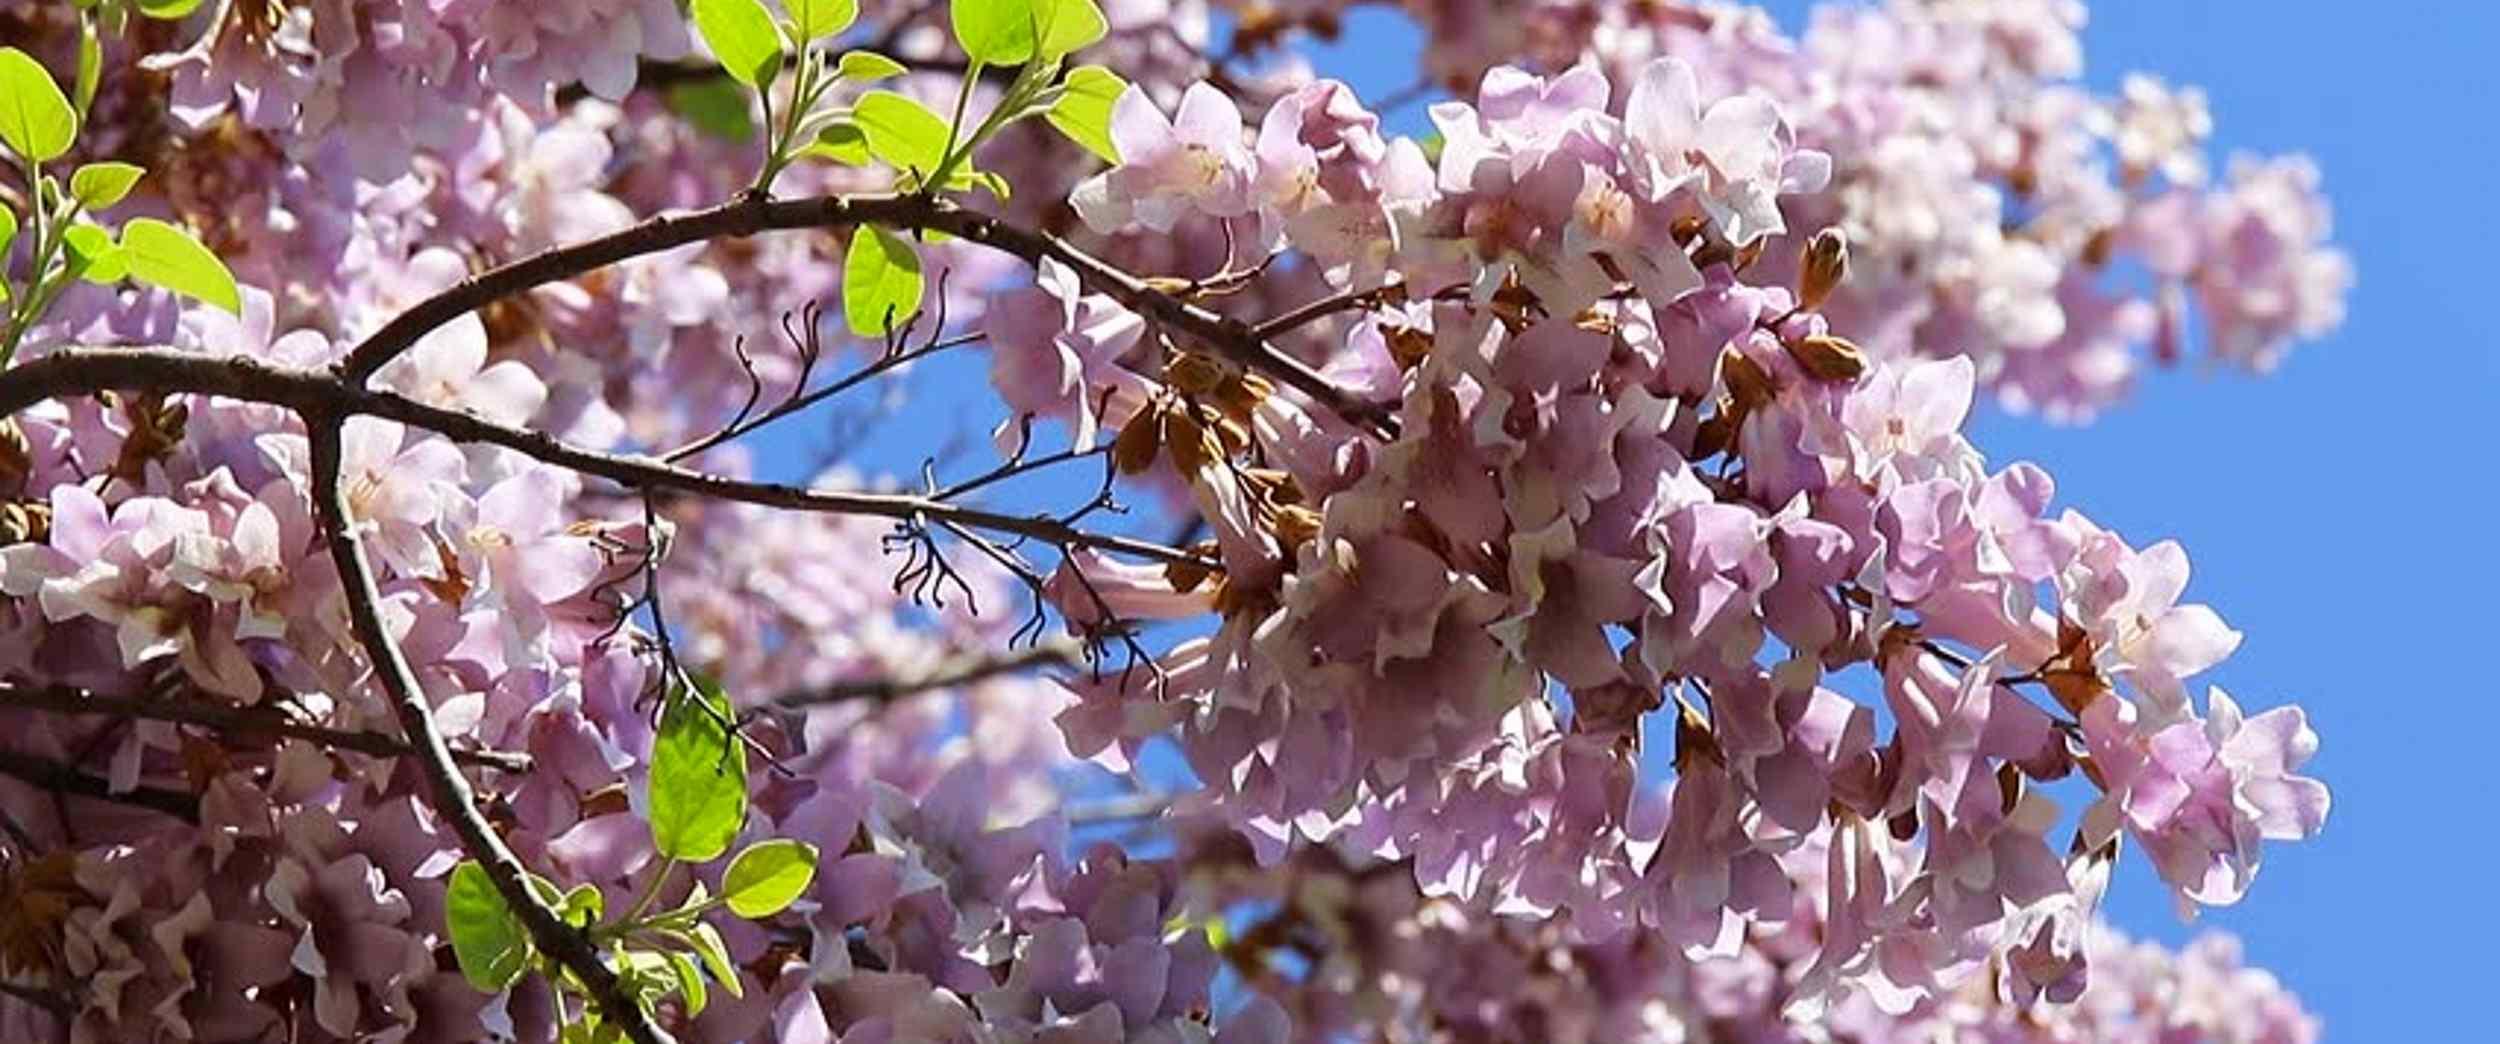 Piantare Alberi Di Paulonia pianta mangia-smog per pulire l'aria - vivafm